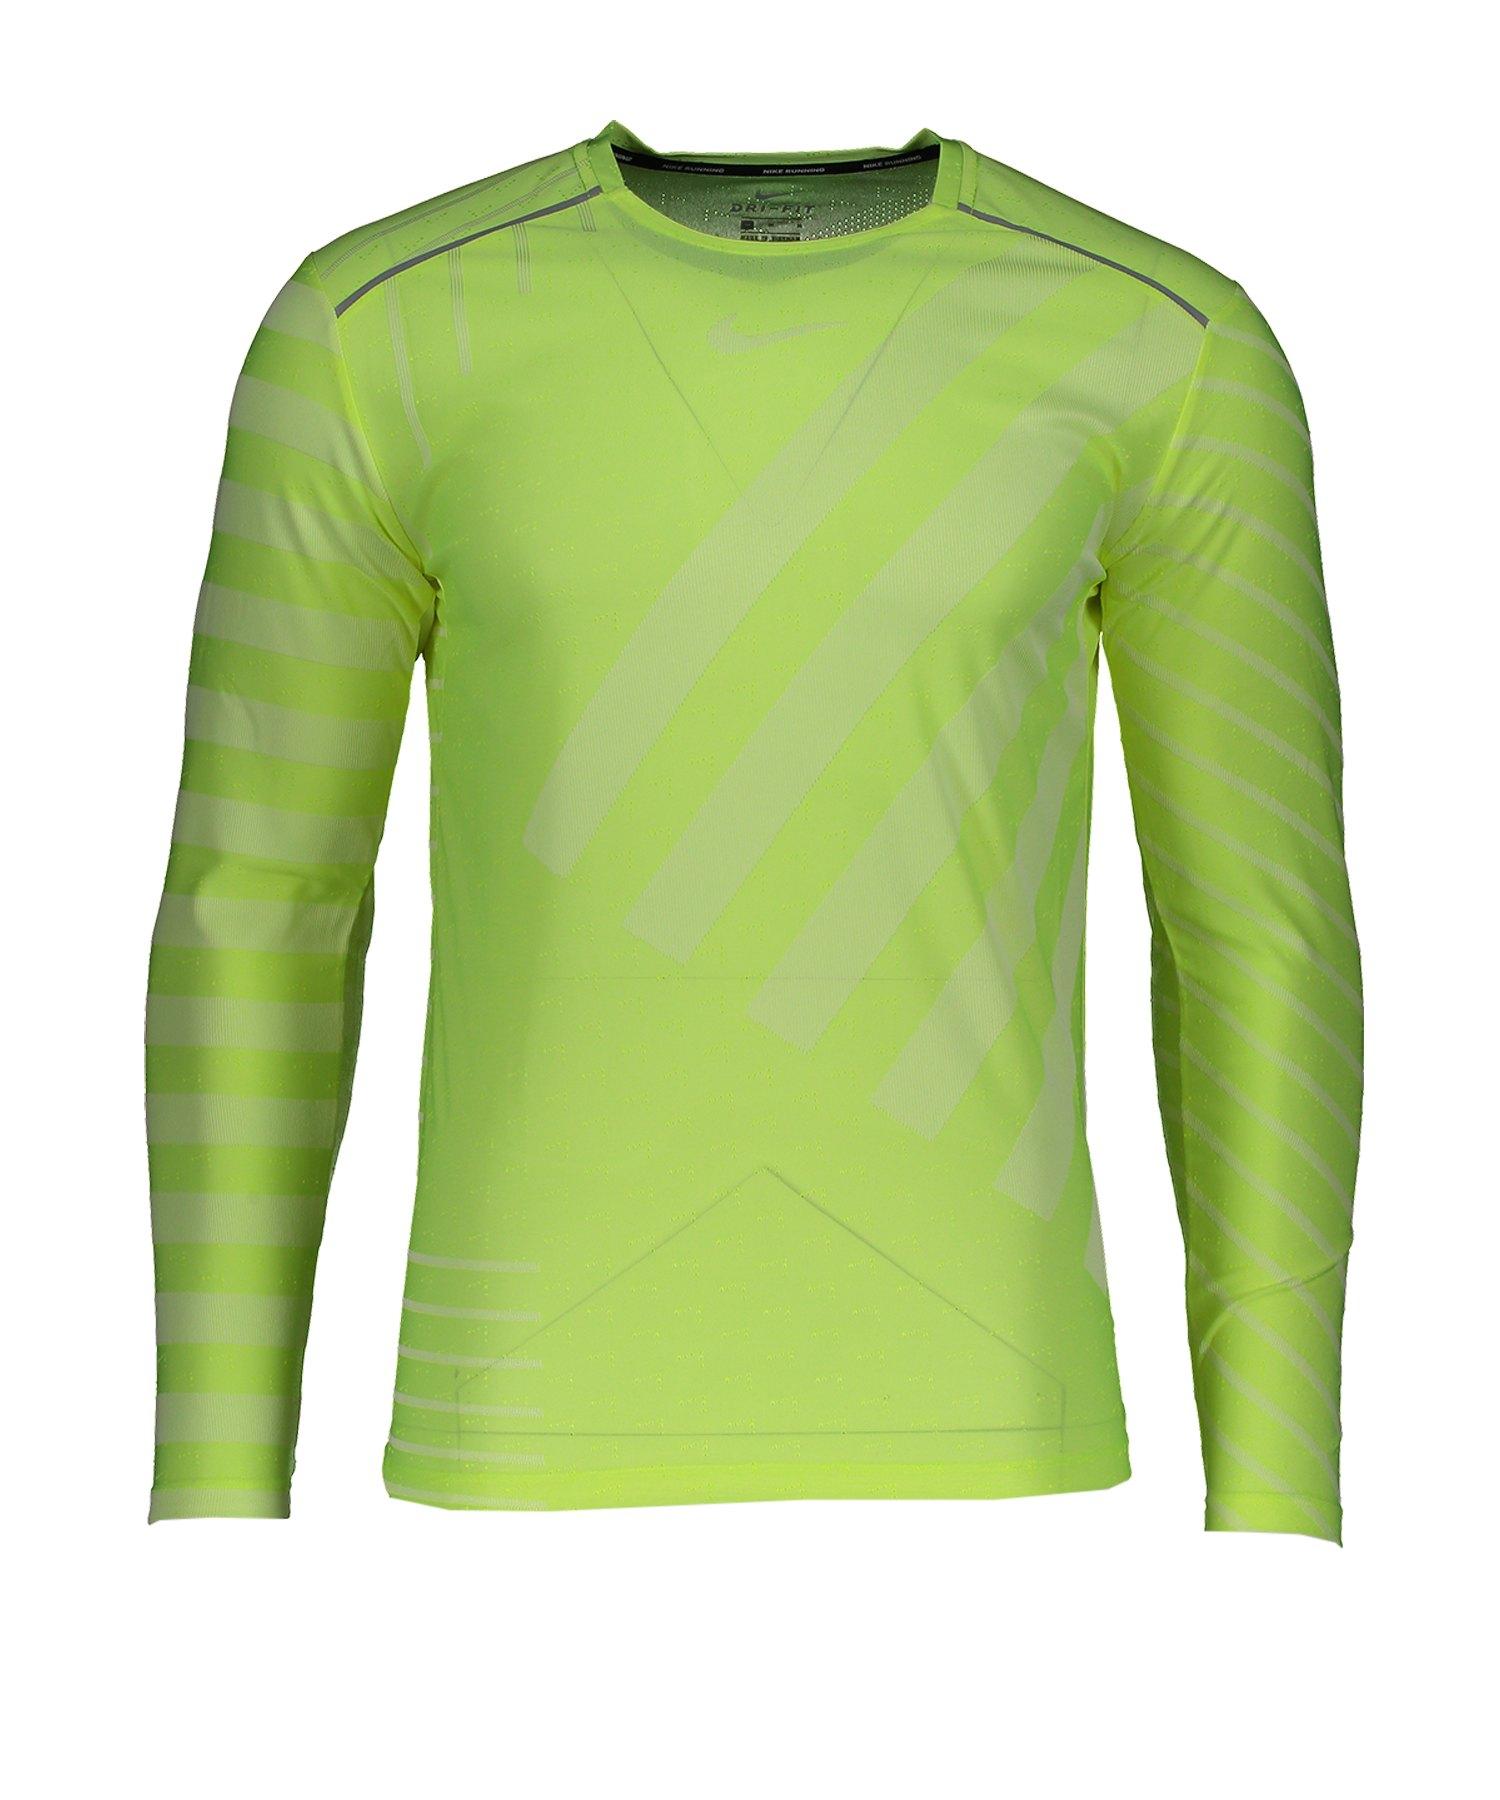 Nike Tech Knit Trainingsshirt langarm Gelb F702 - gelb